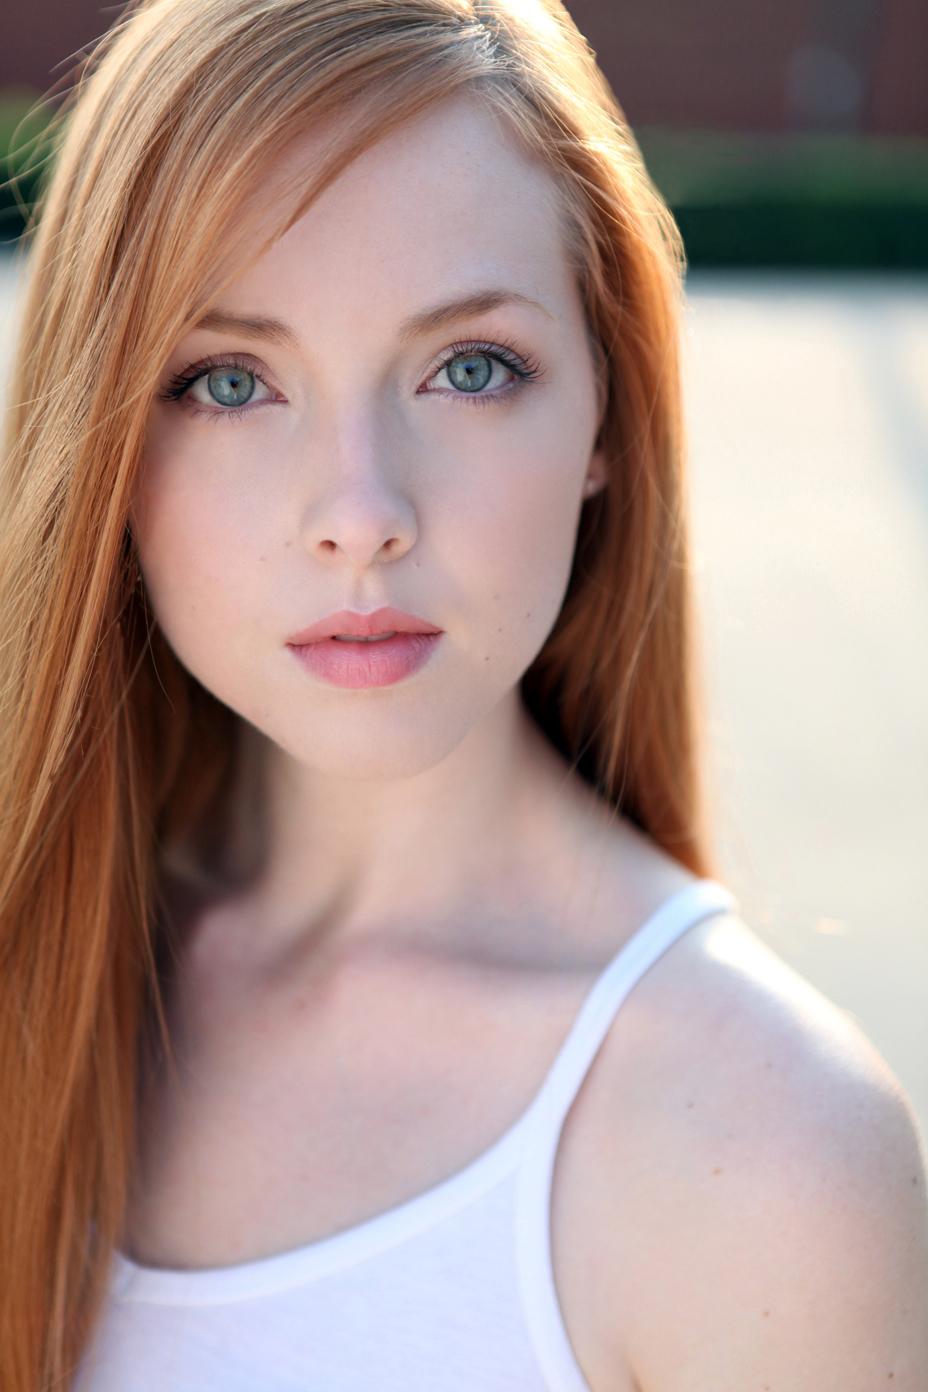 Kimberly Whalen